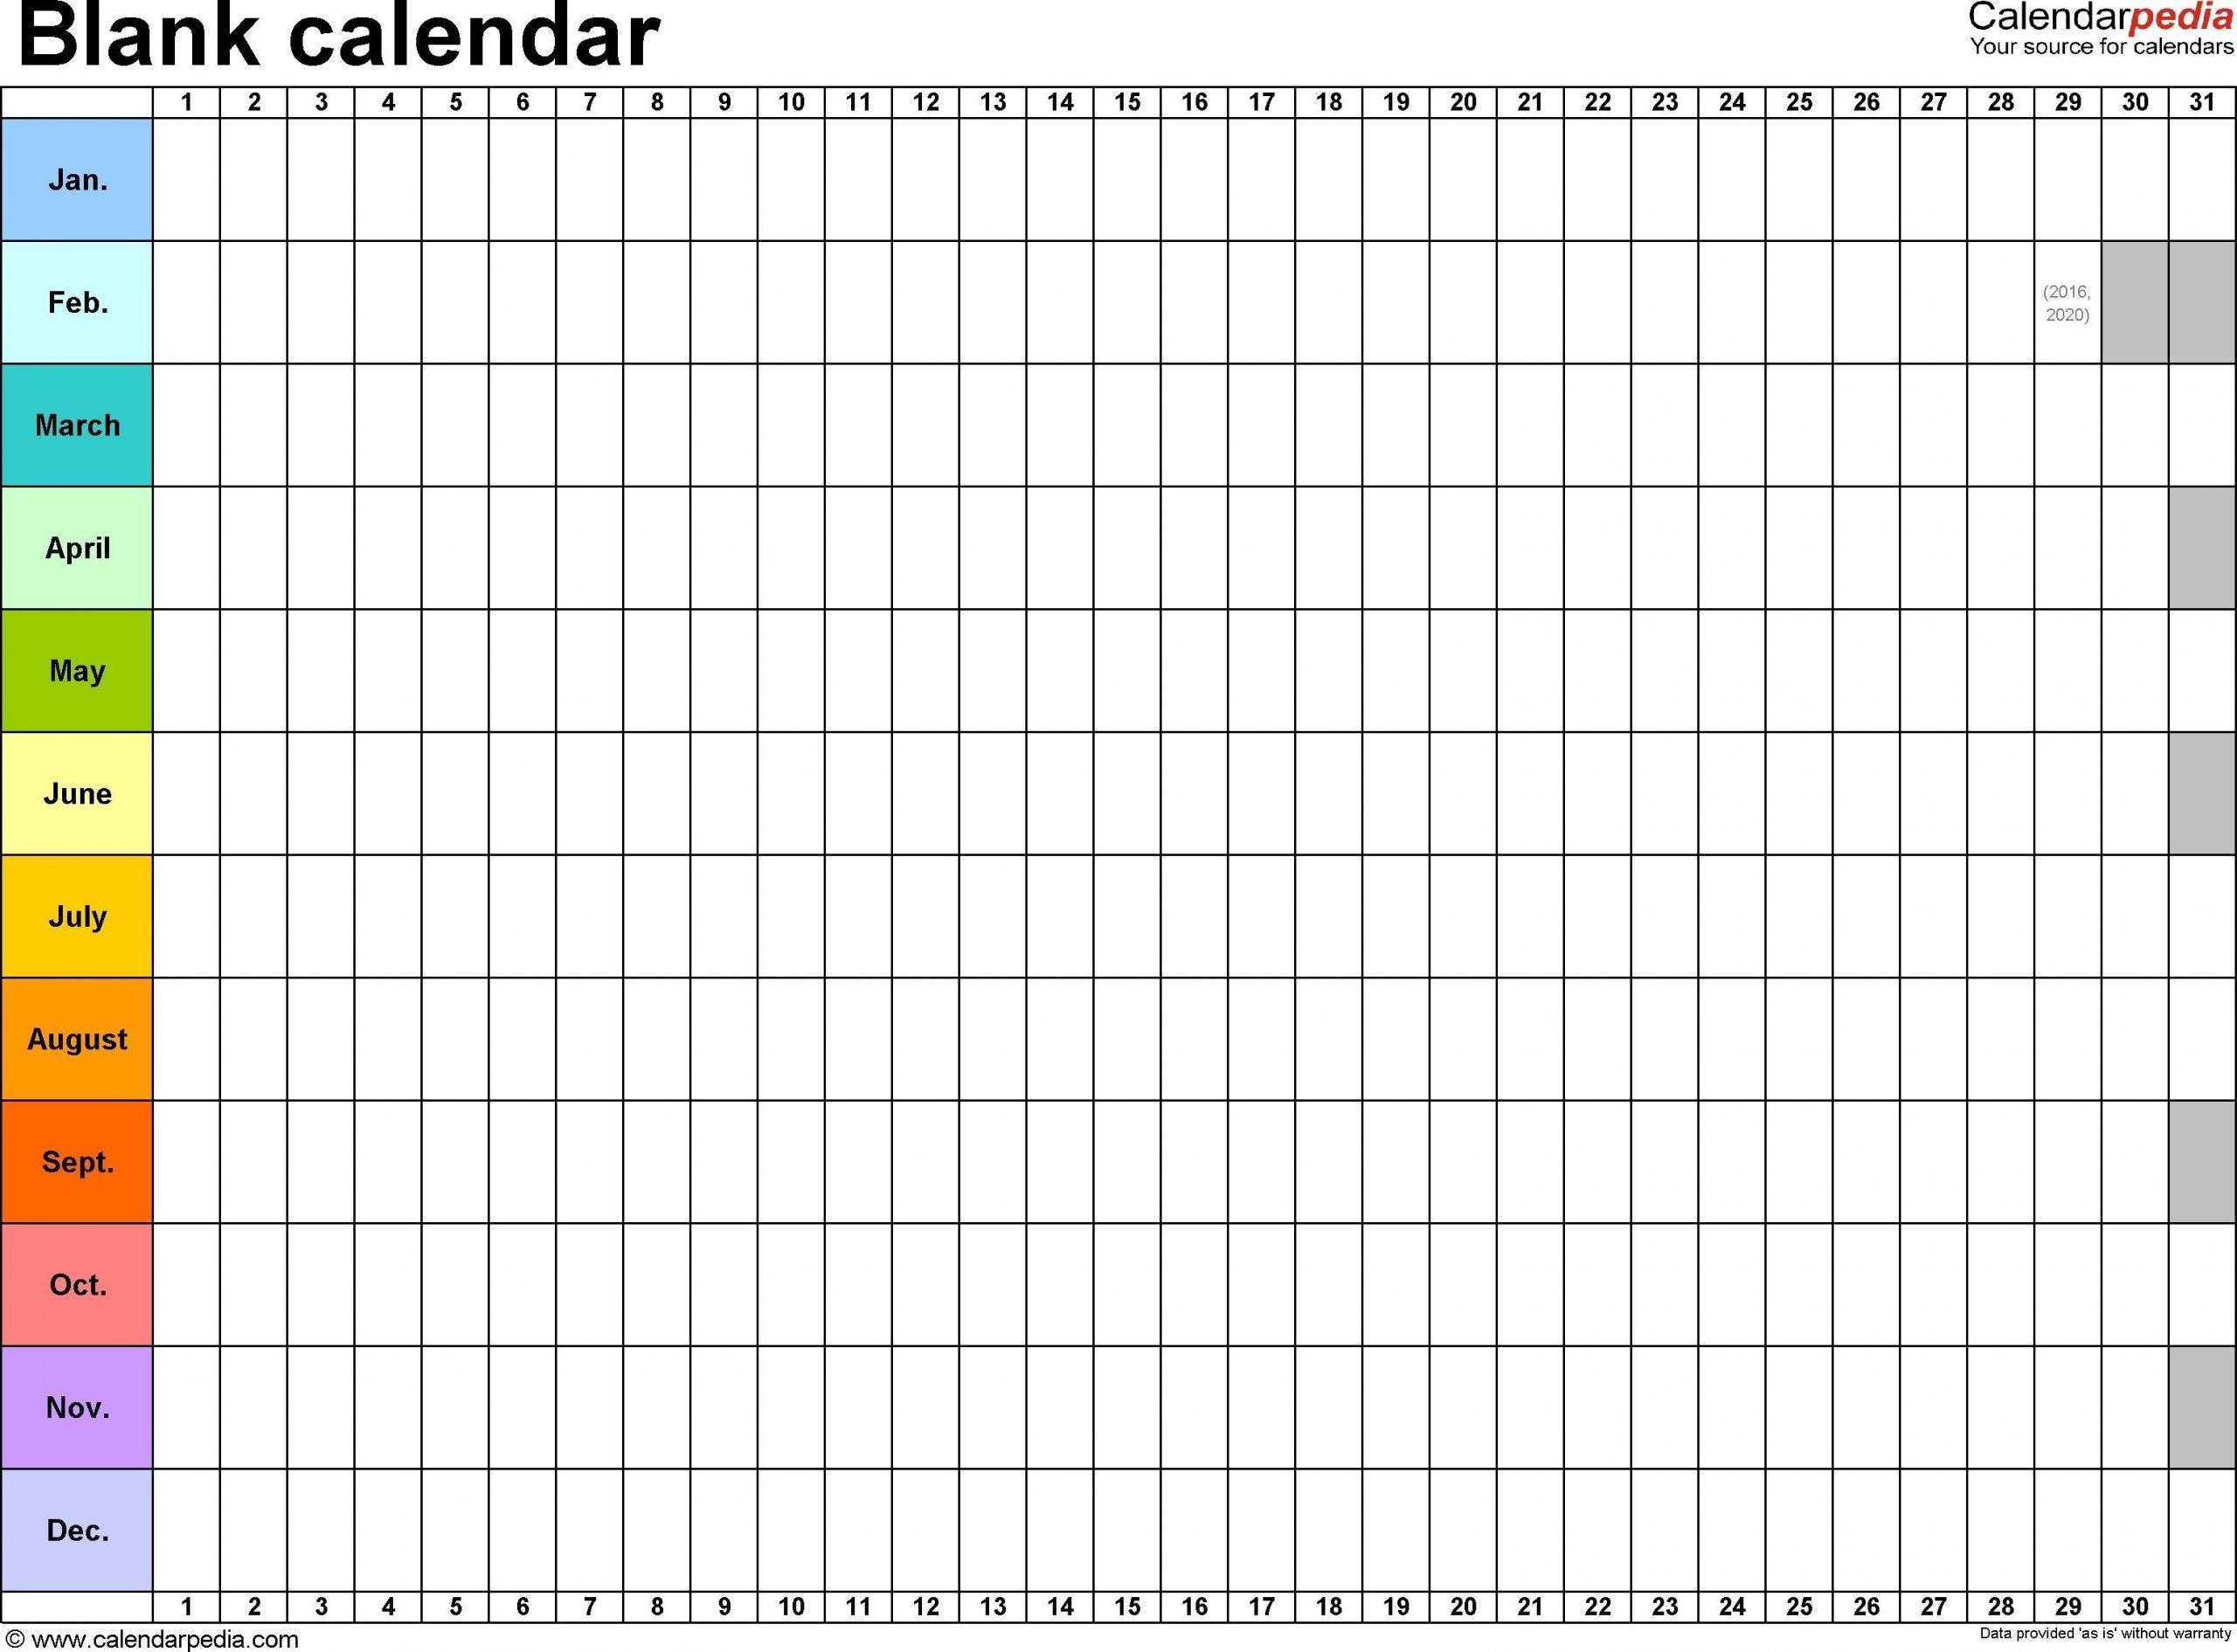 Free Printable Blank 3 Month Calendar | Blank Calendar  Free Printable Firefighter Editable Calendar